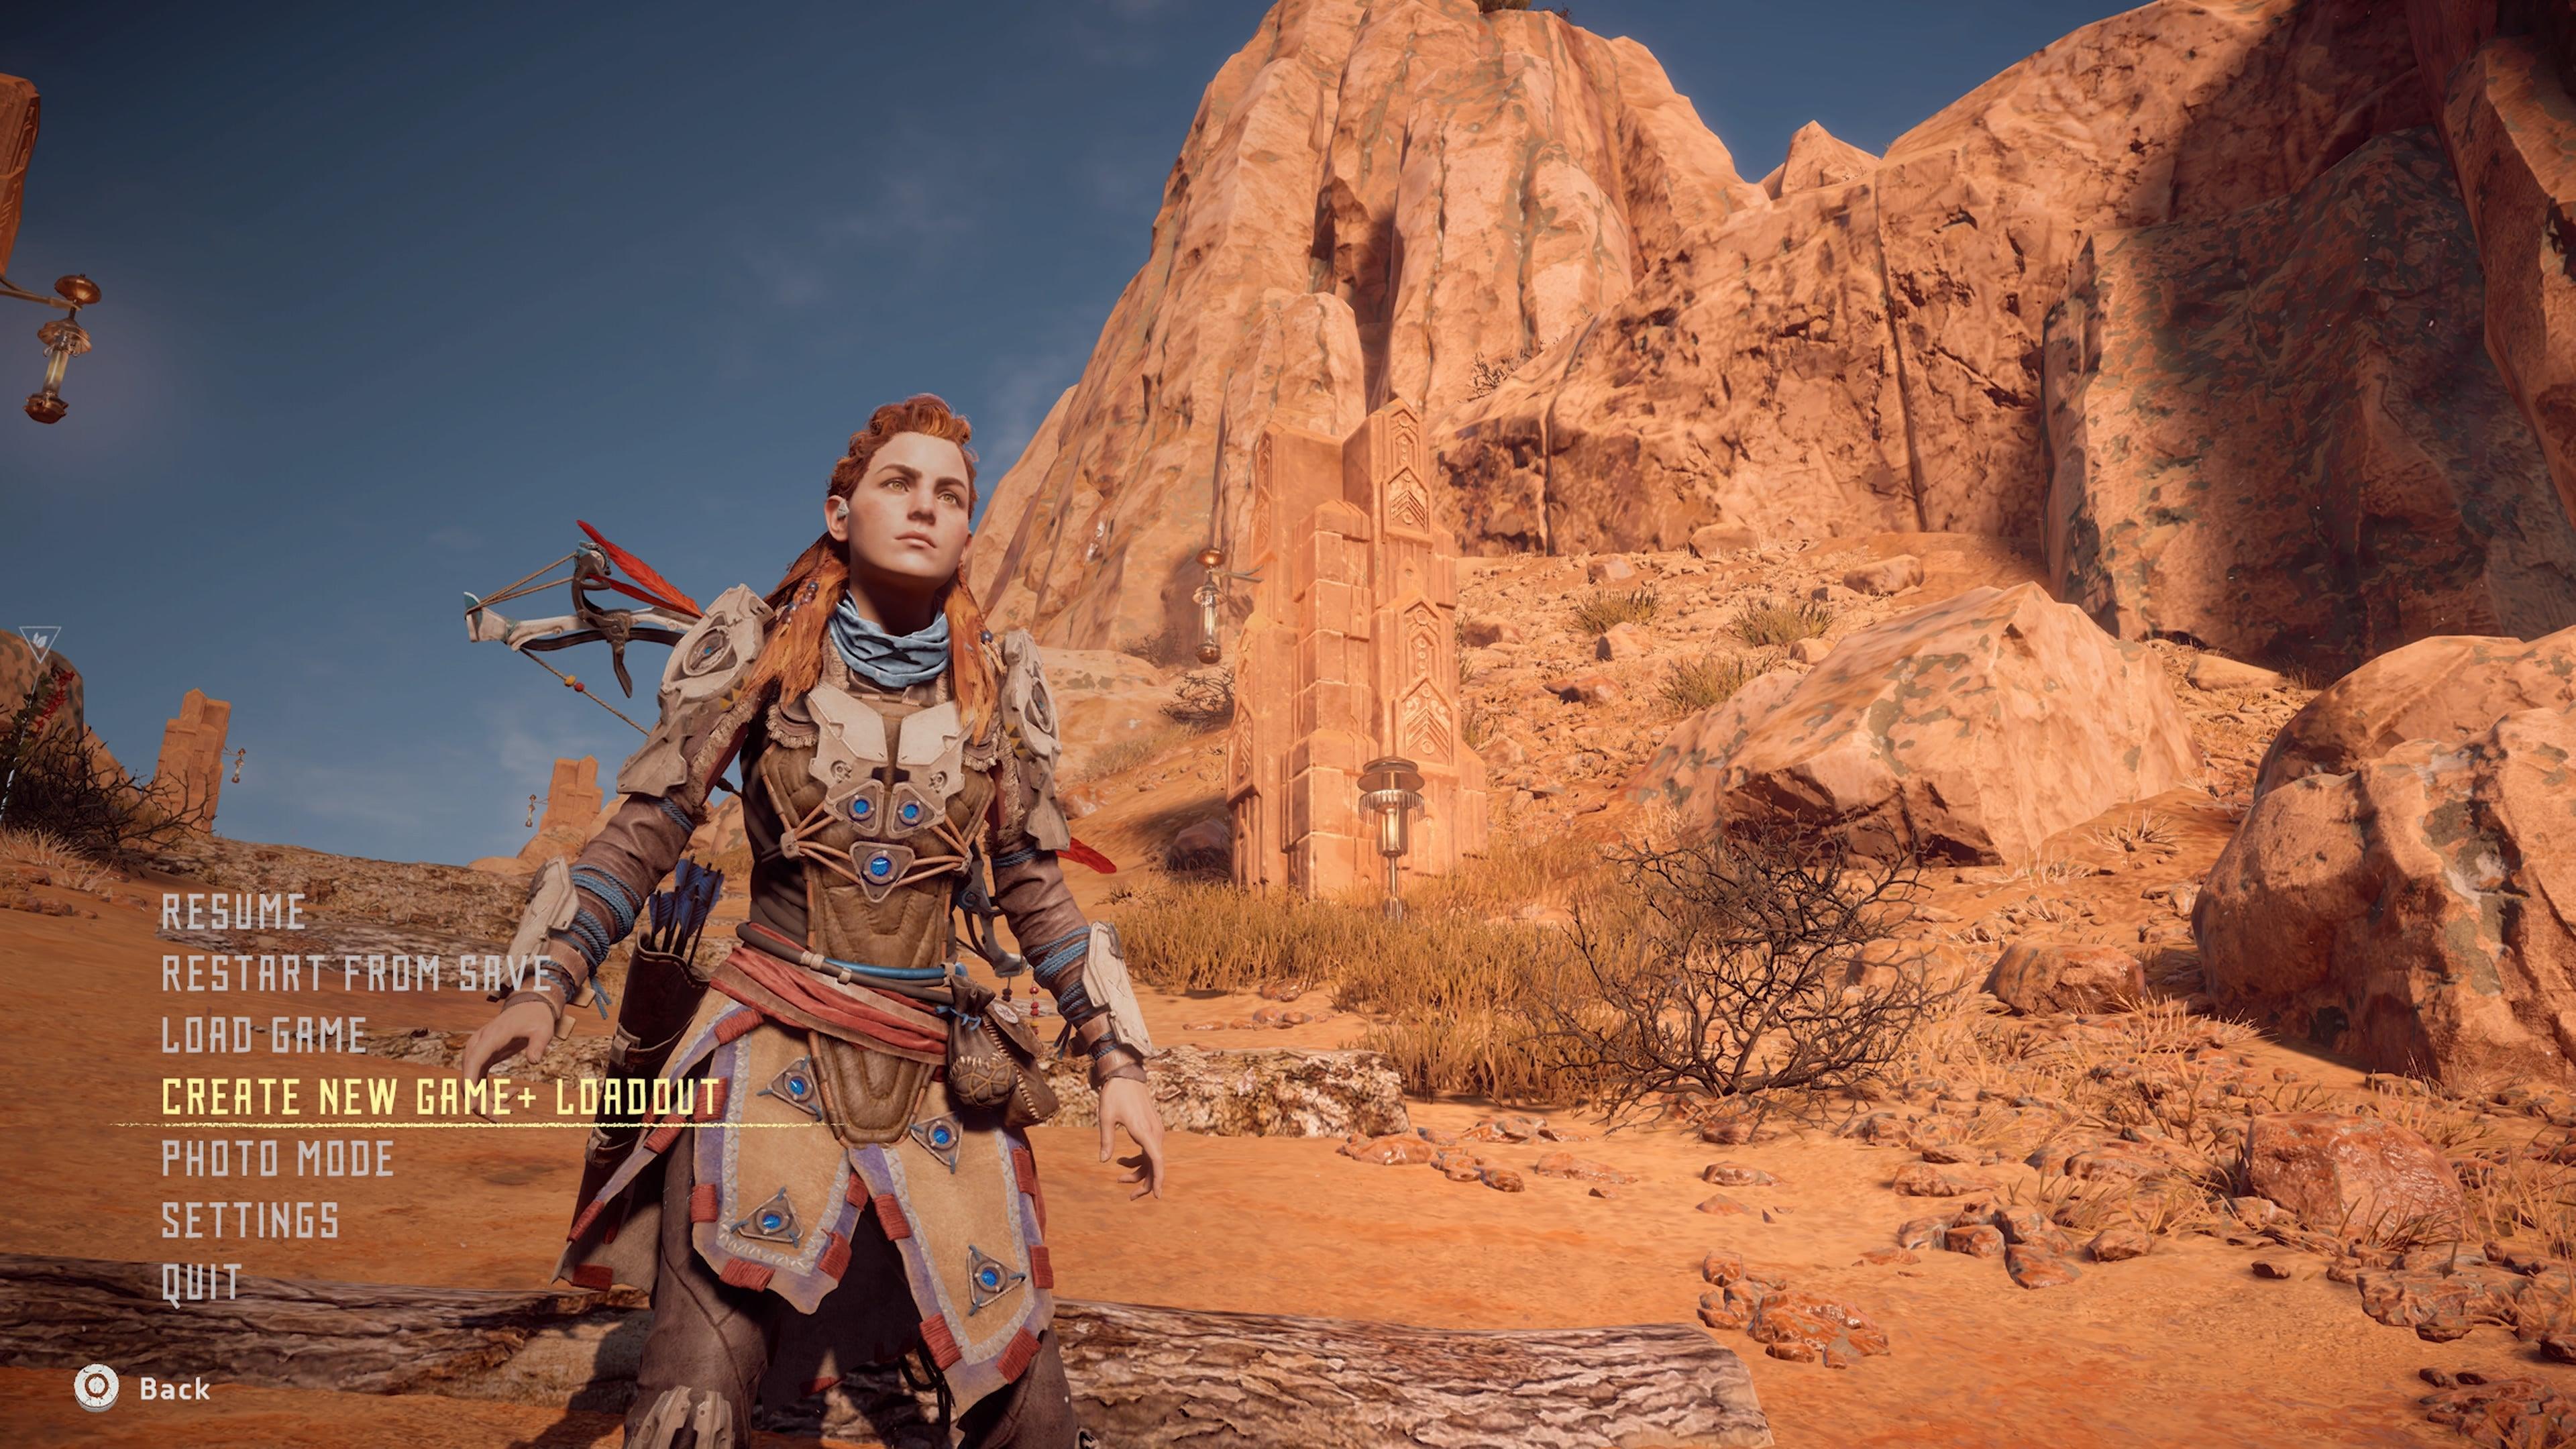 Horizon Zero Dawn update adds Game+, Ultra Hard difficulty